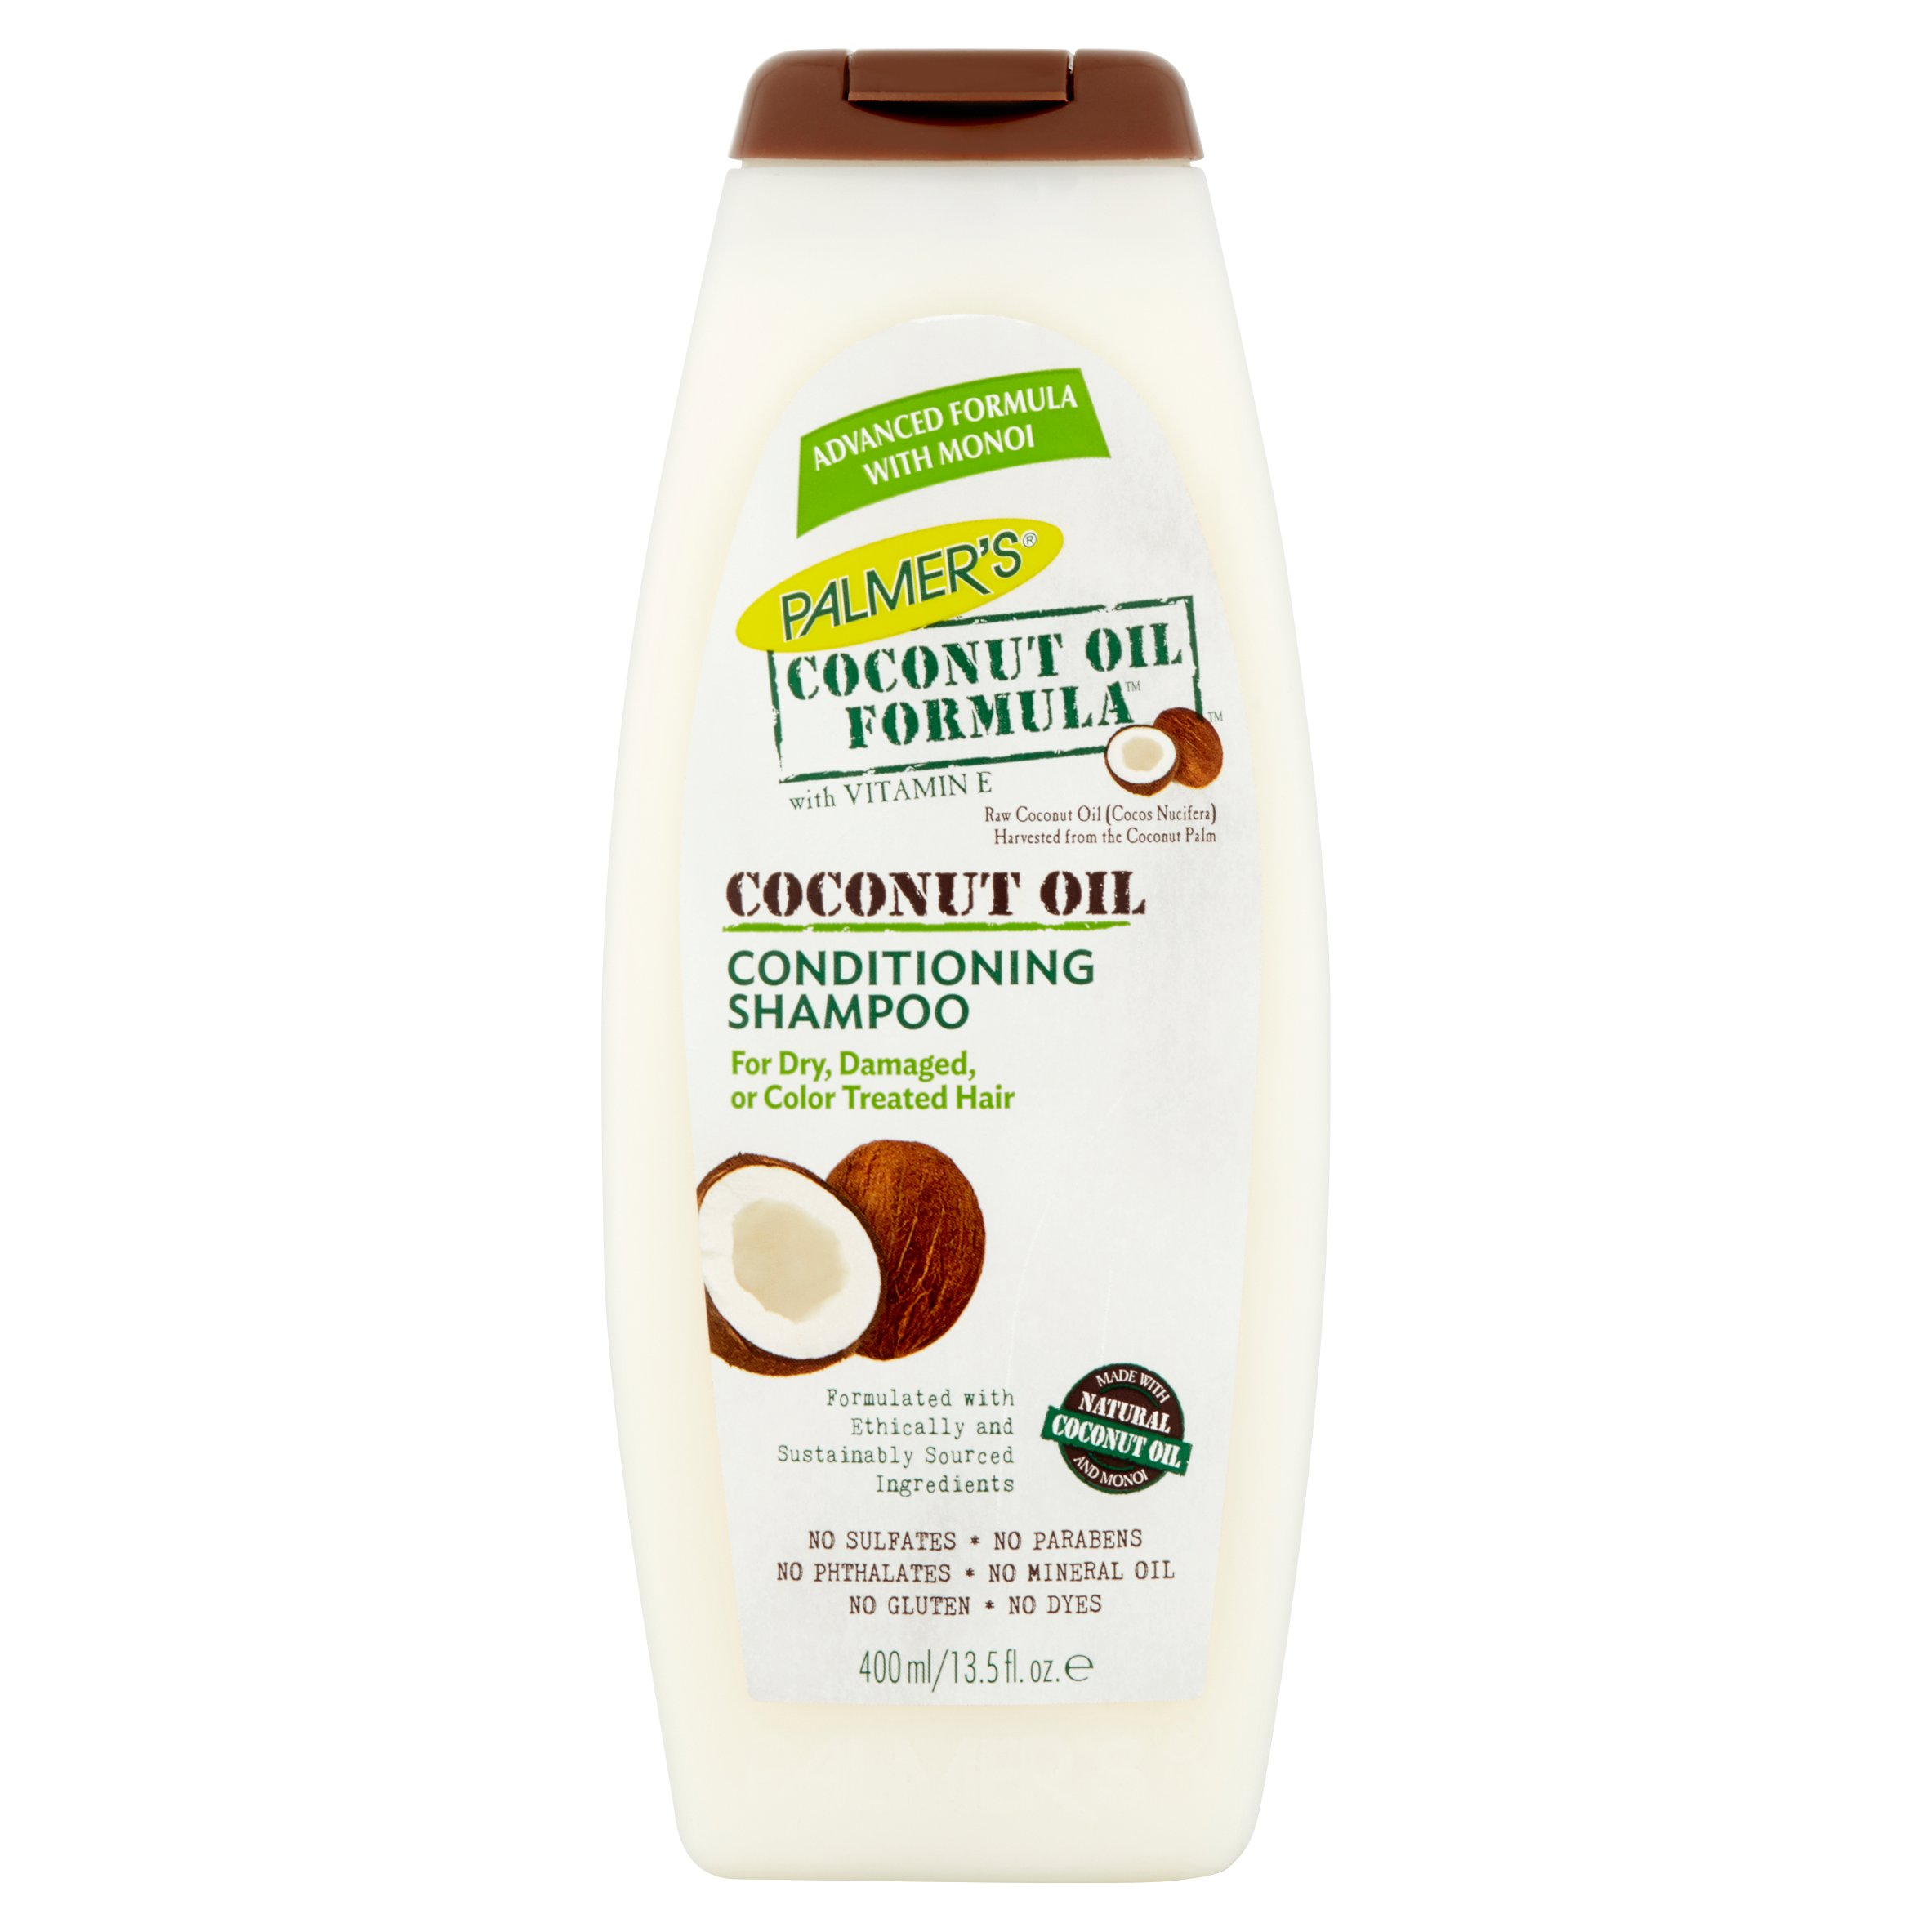 Palmer's Coconut Oil Formula Conditioning Shampoo, 13.5 Oz